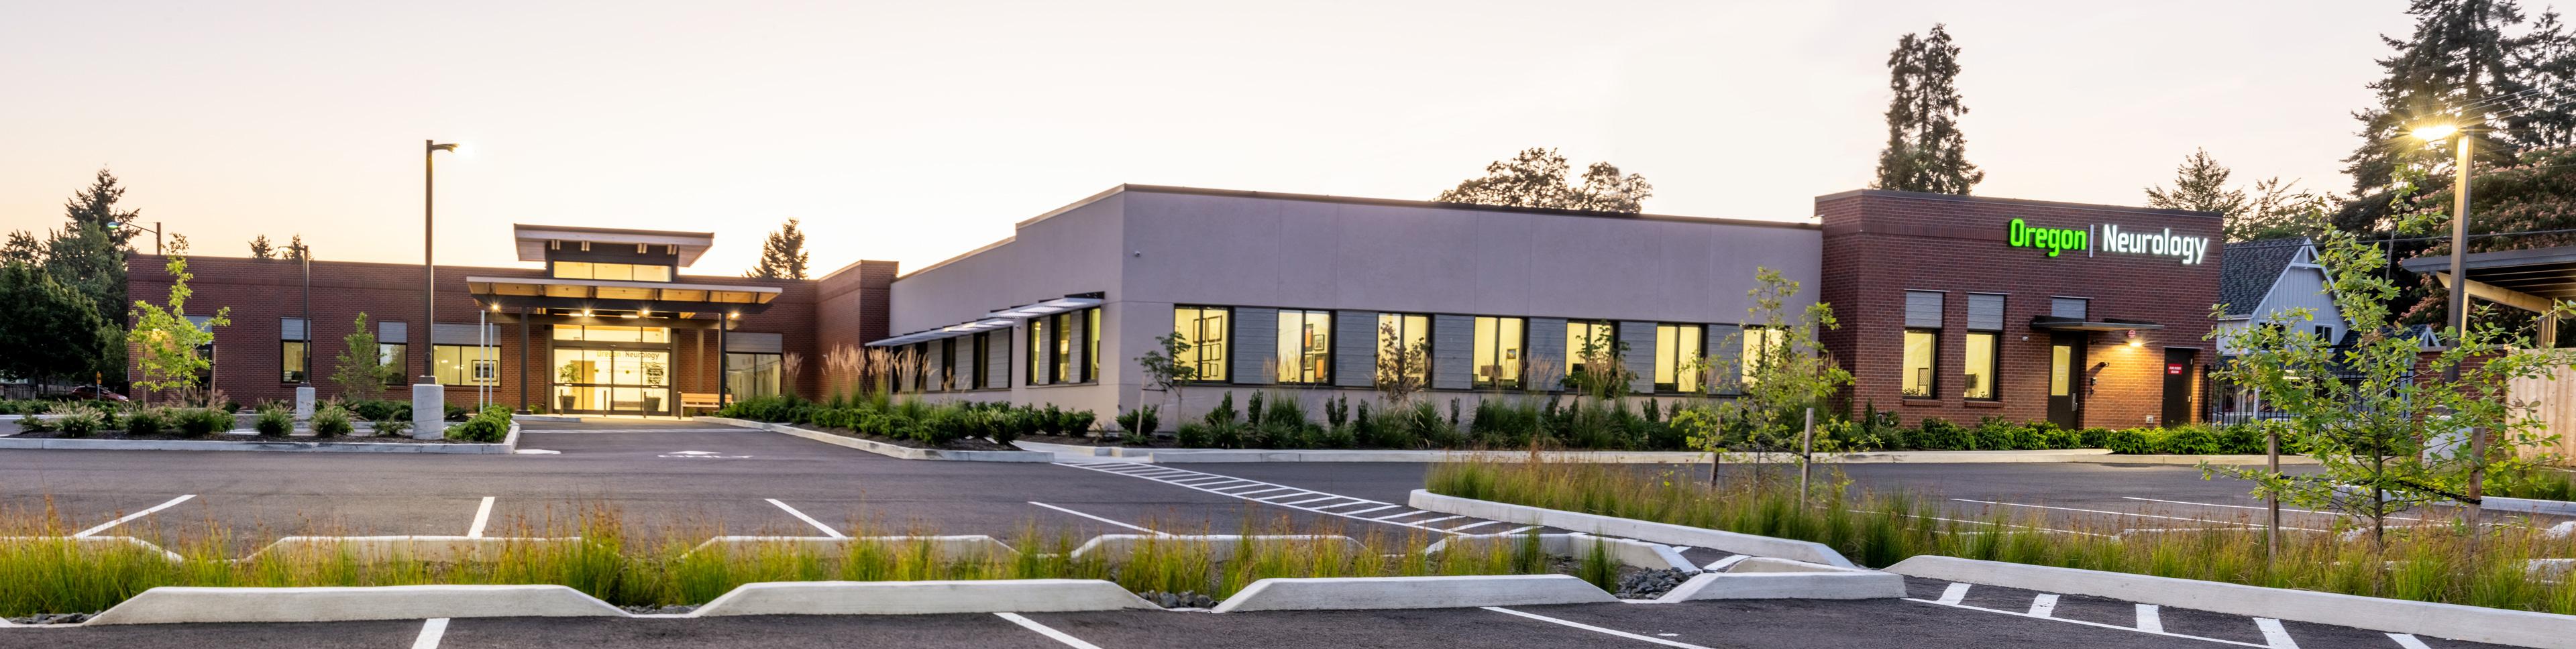 Oregon_Neurology_building_exterior